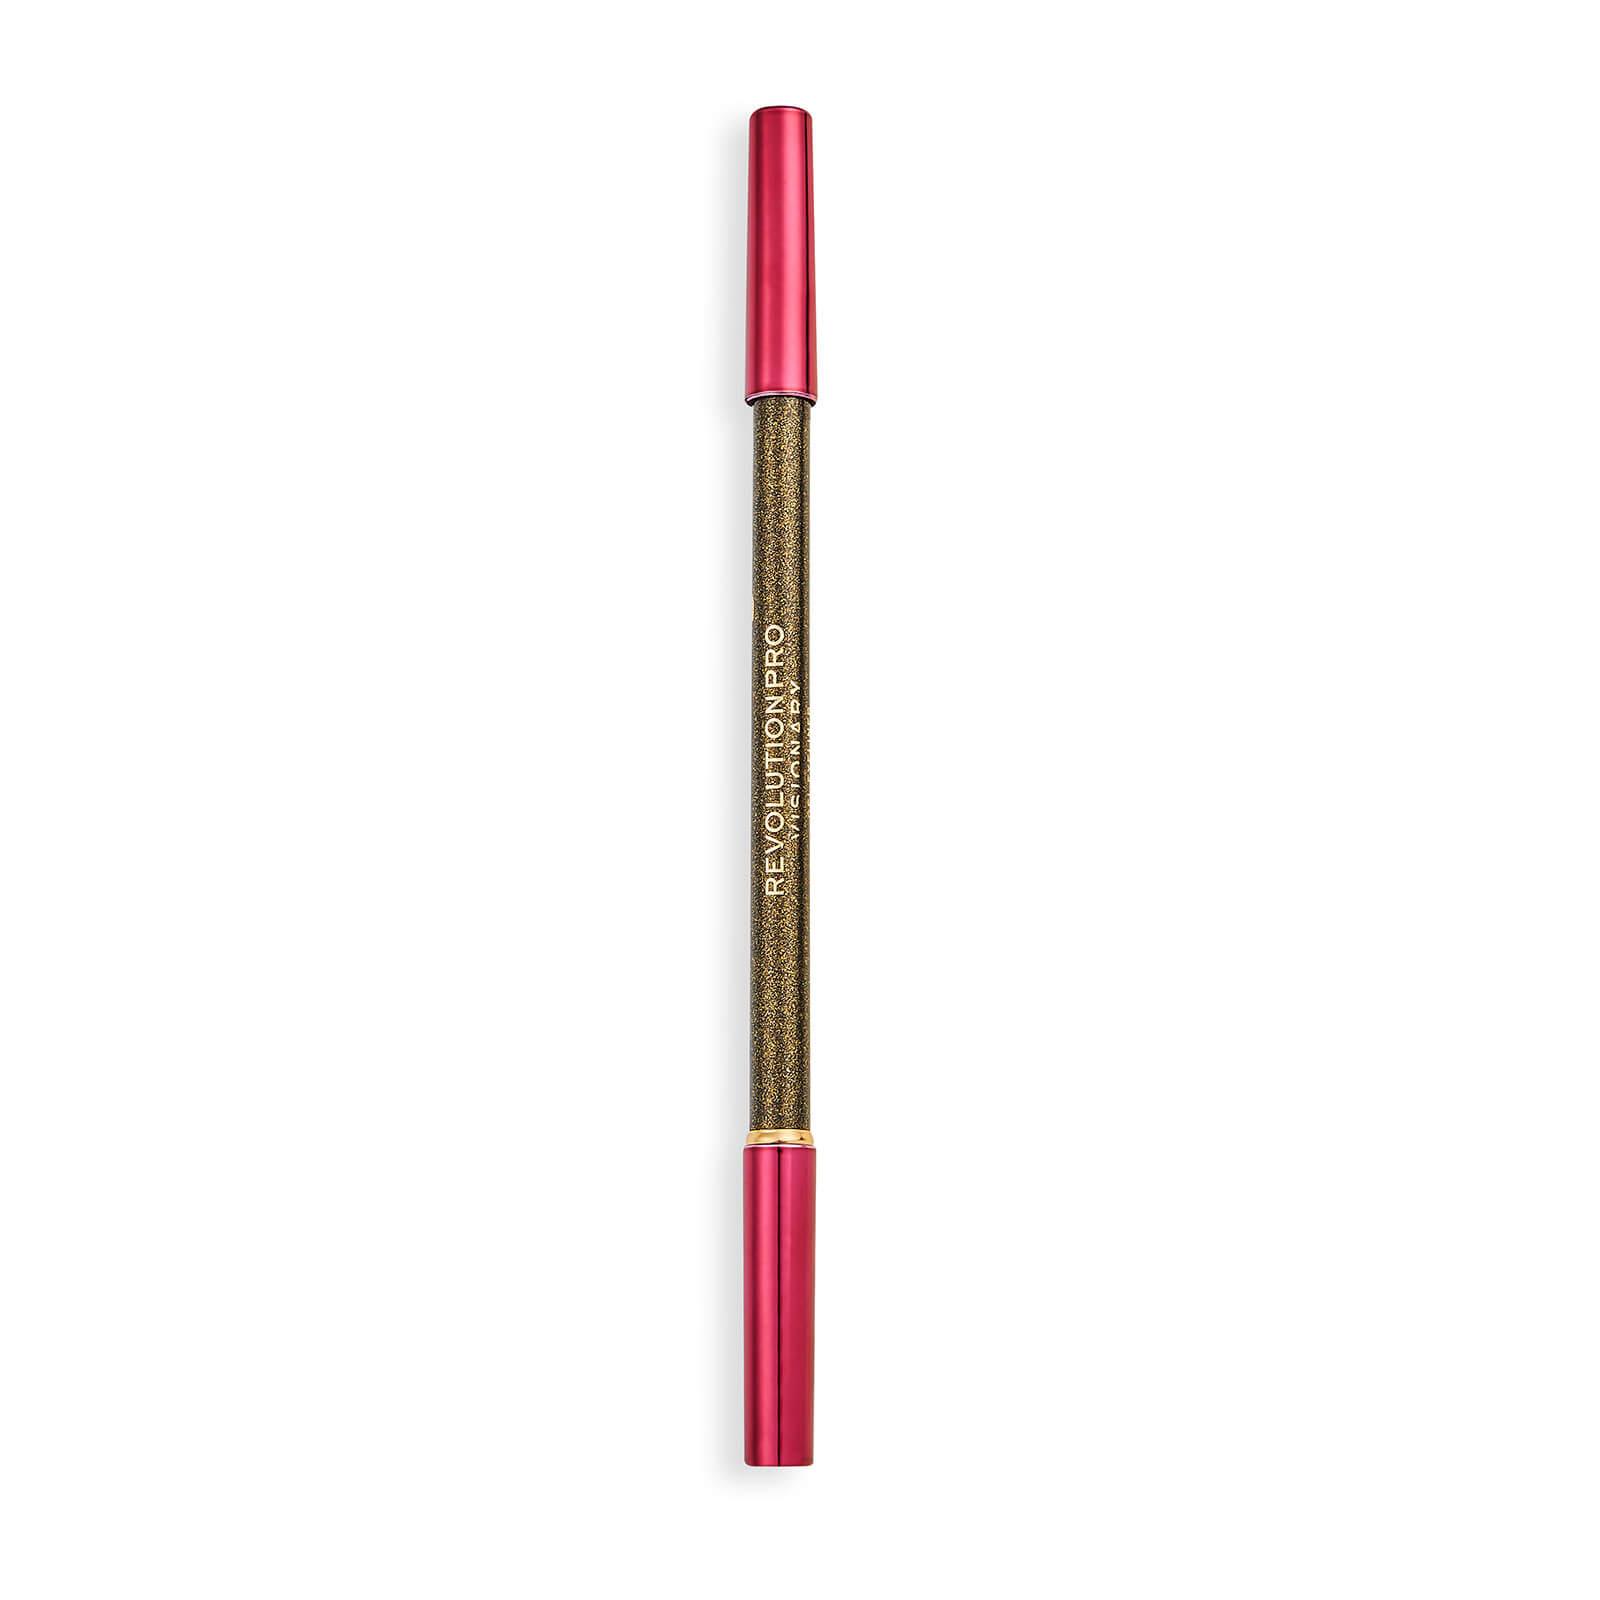 Купить Revolution Pro Visionary Gel Eyeliner Pencil Burgundy